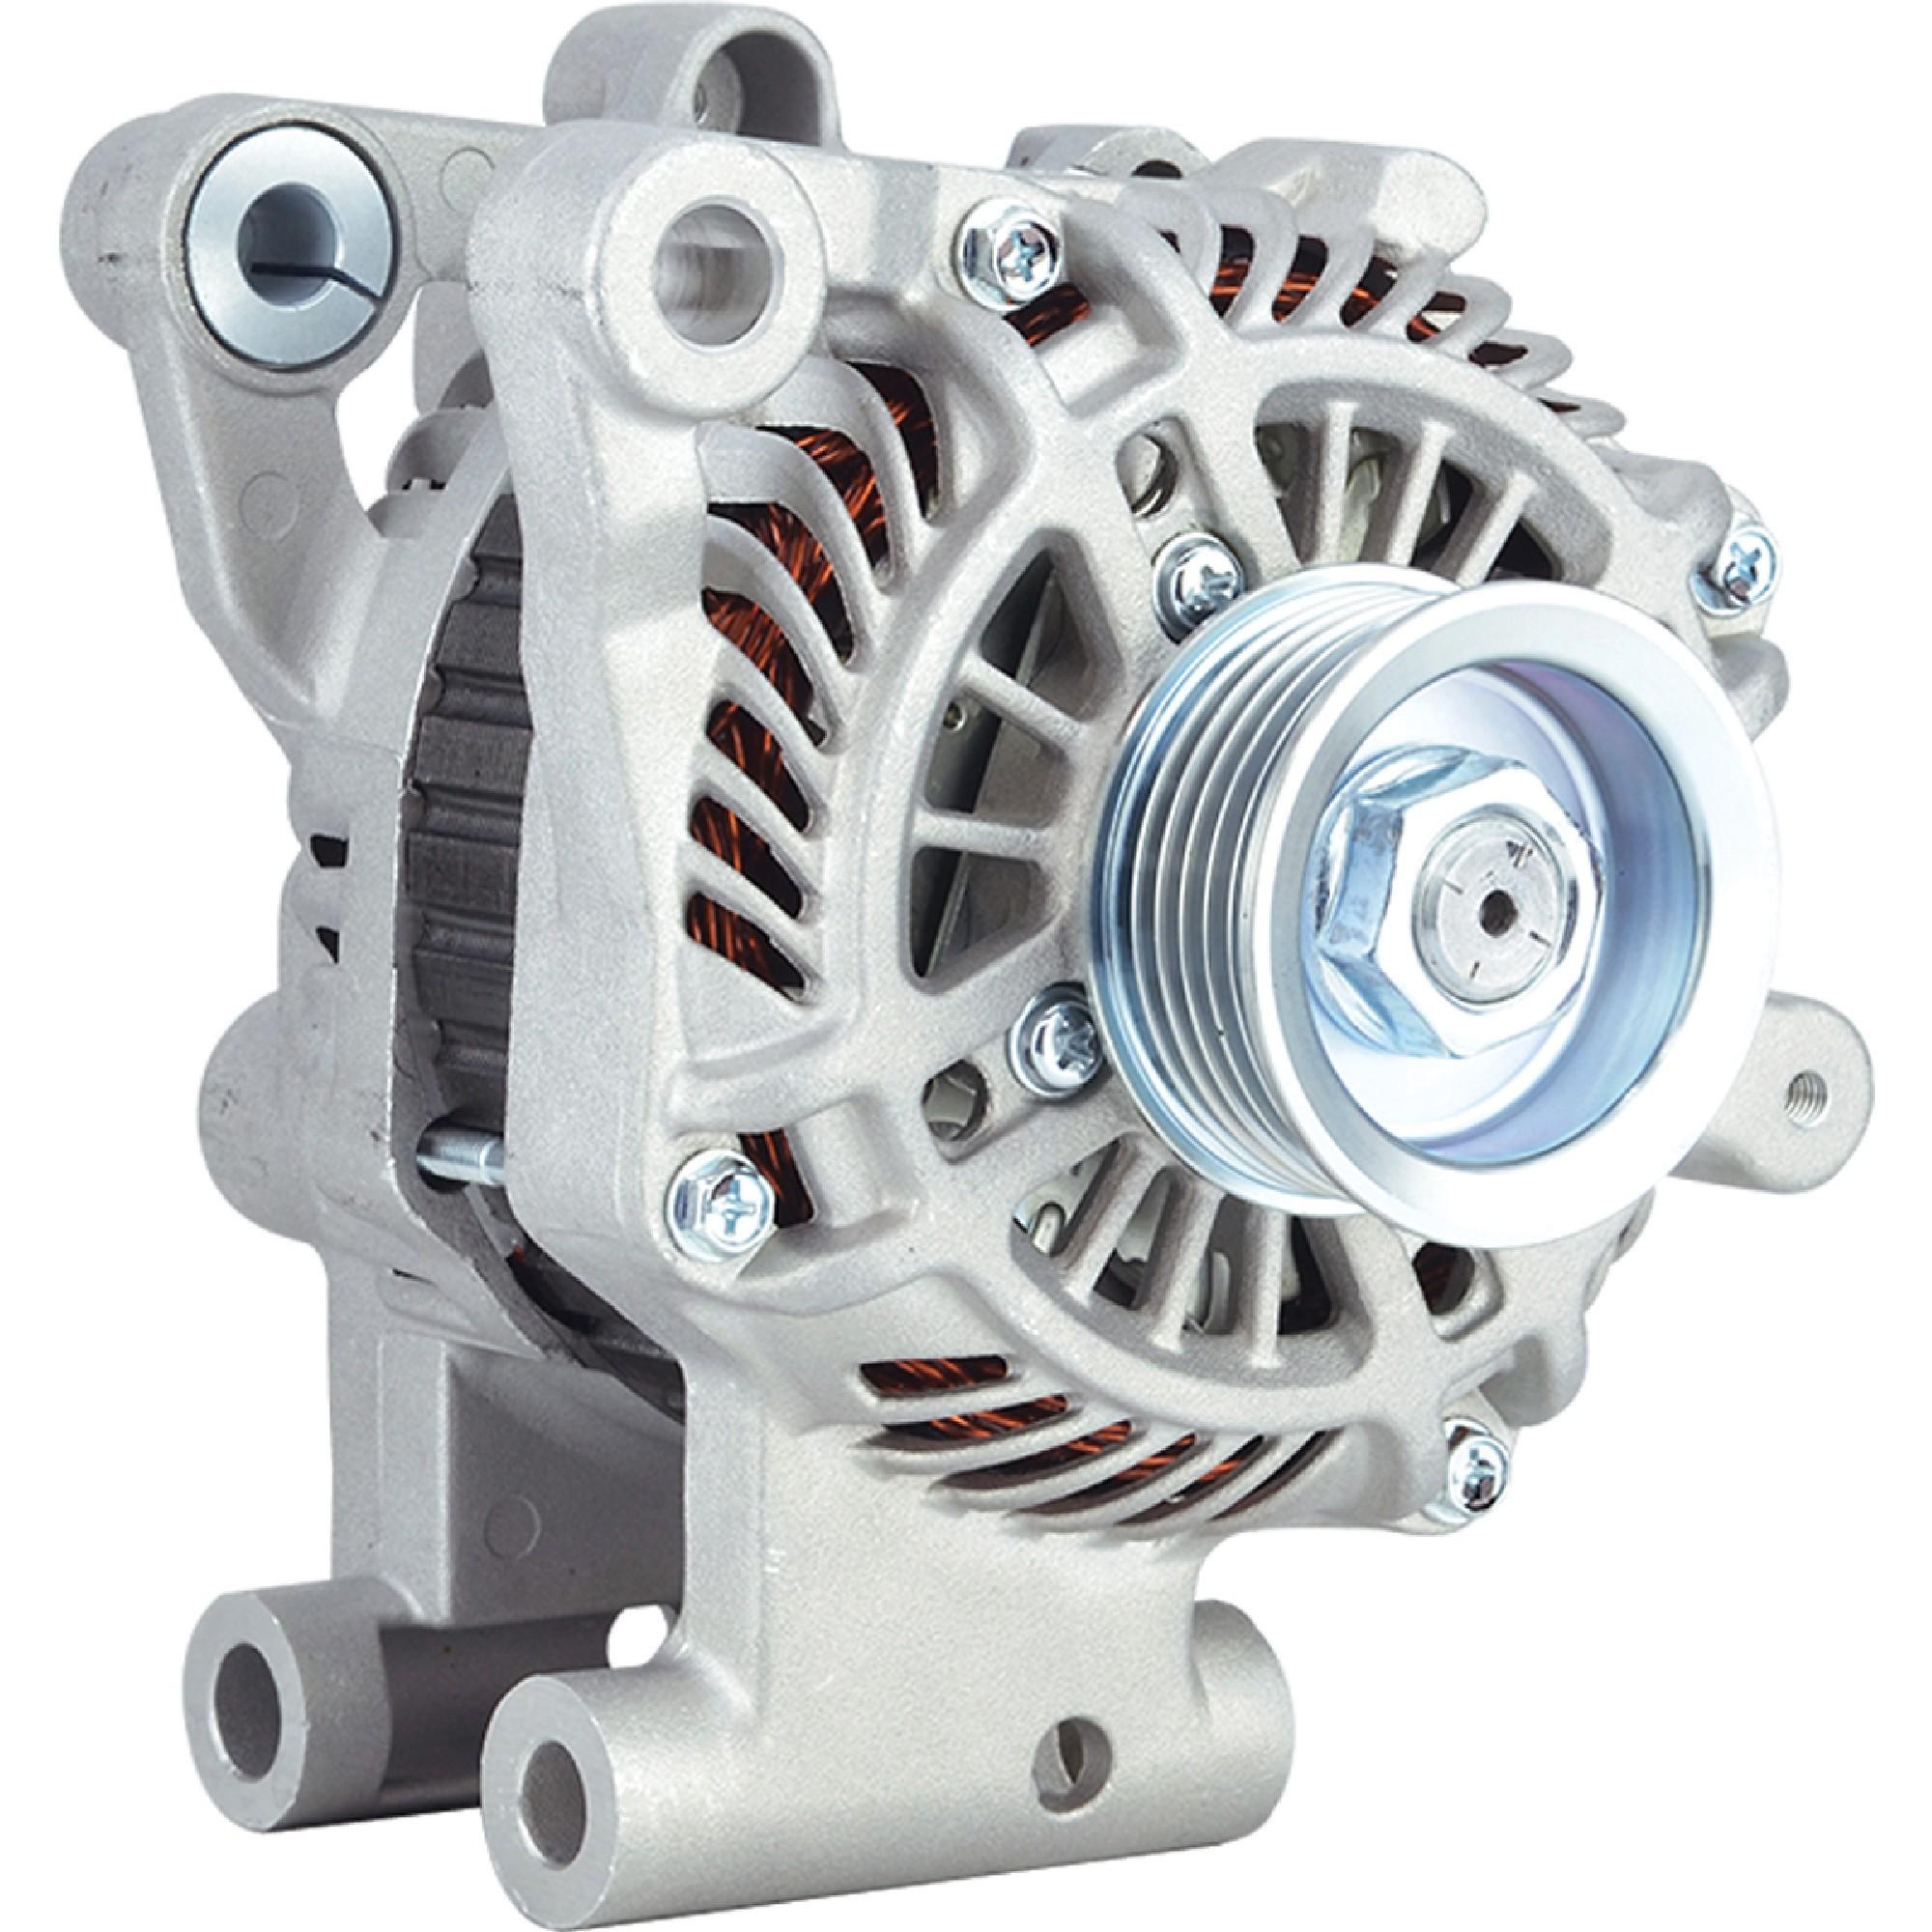 New Automotive Alternator for 2.0L Suzuki SX4 10-13 400-48253 LRA03890 AMT0237